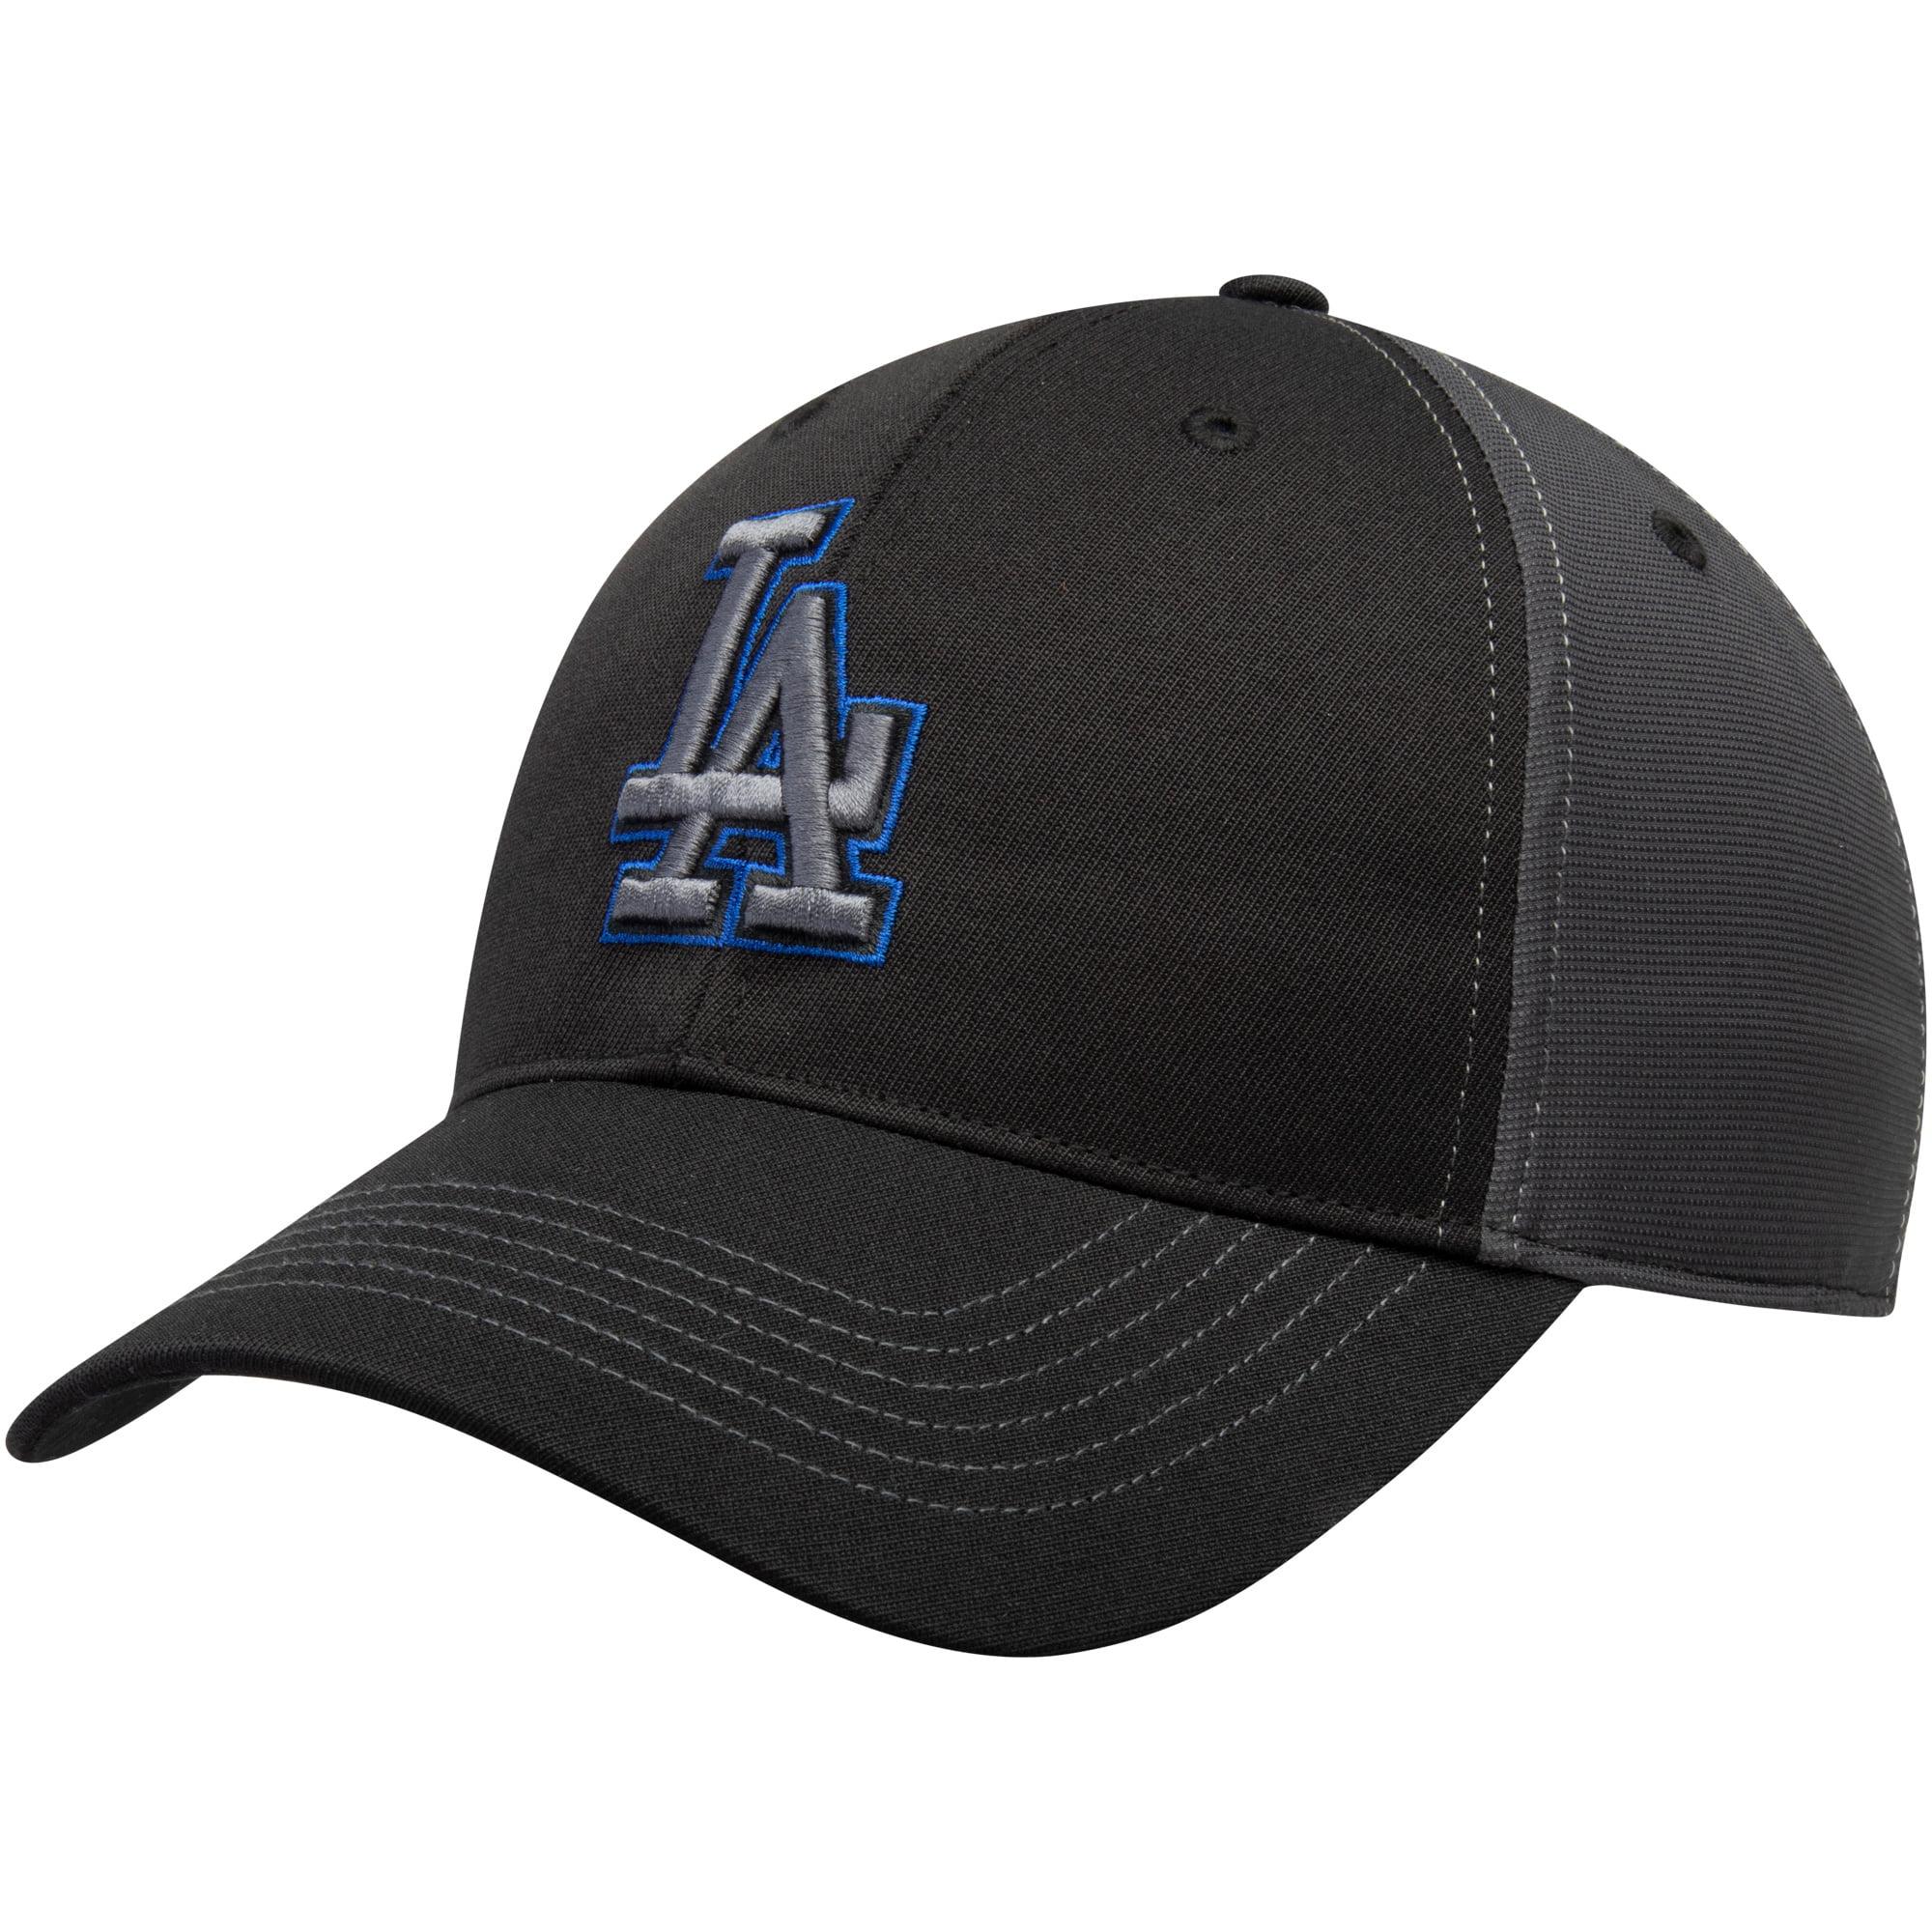 los angeles dodgers fan favorite blackball adjustable hat blackcharcoal osfa walmartcom